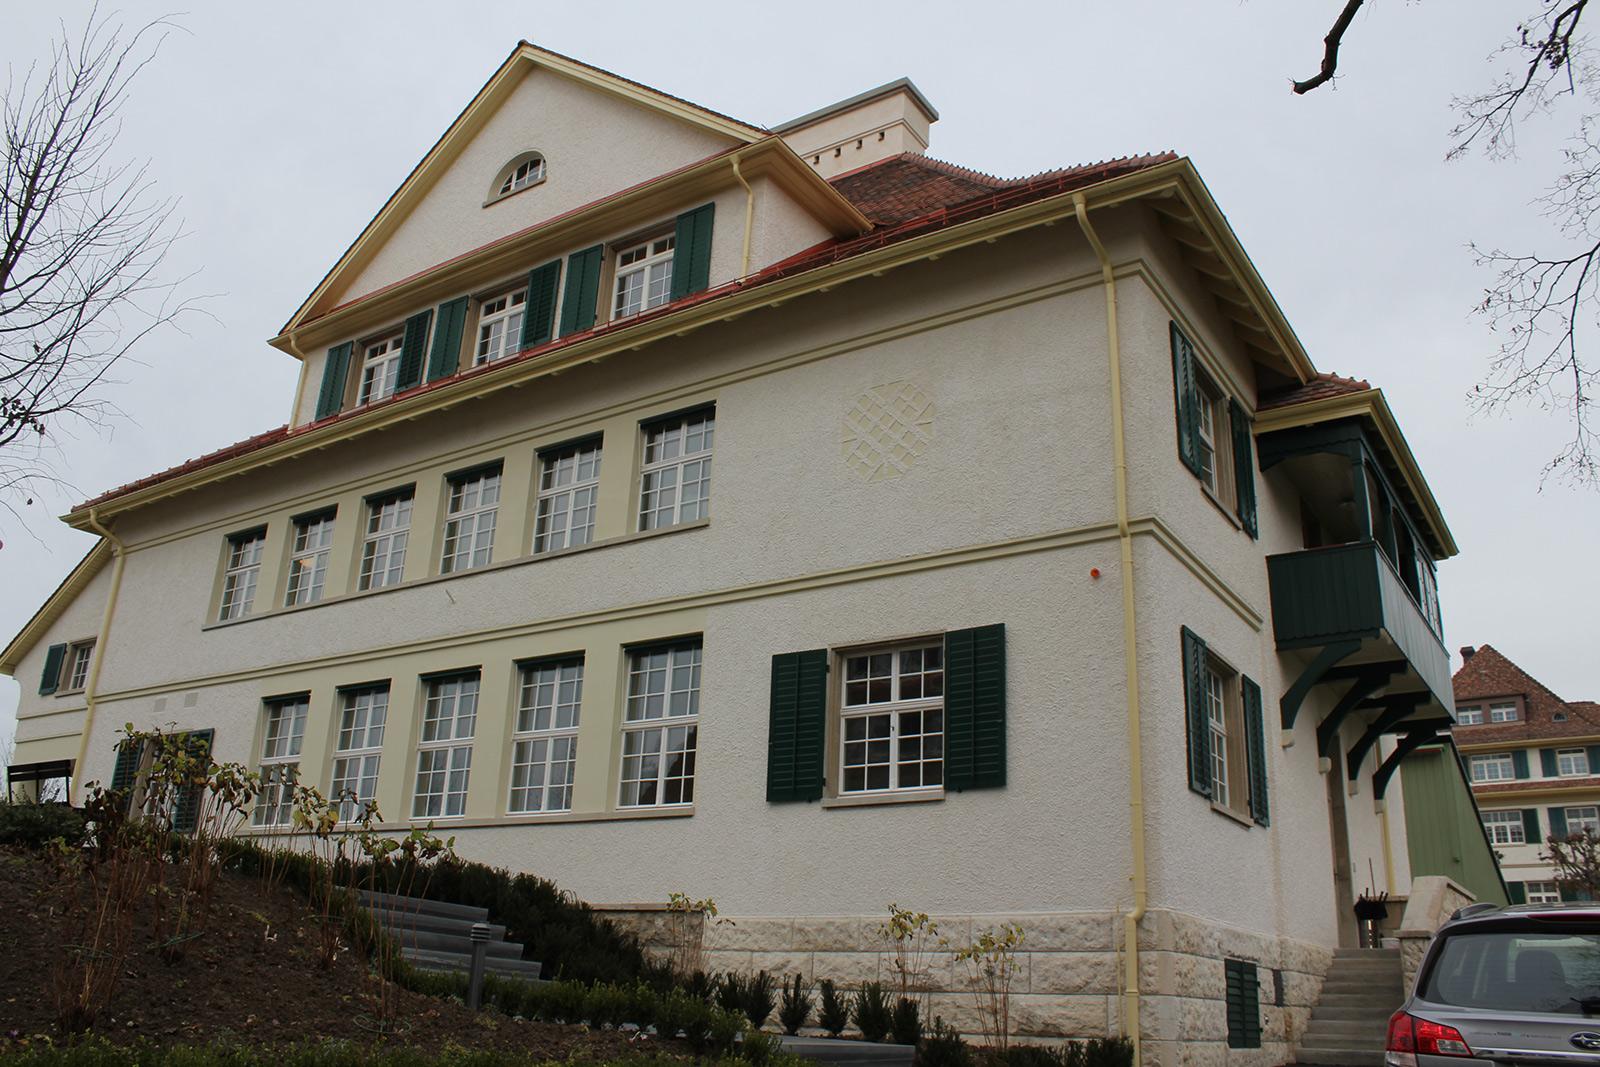 klinik hohenegg haus 4 meilen historfen historische fenster renovieren. Black Bedroom Furniture Sets. Home Design Ideas